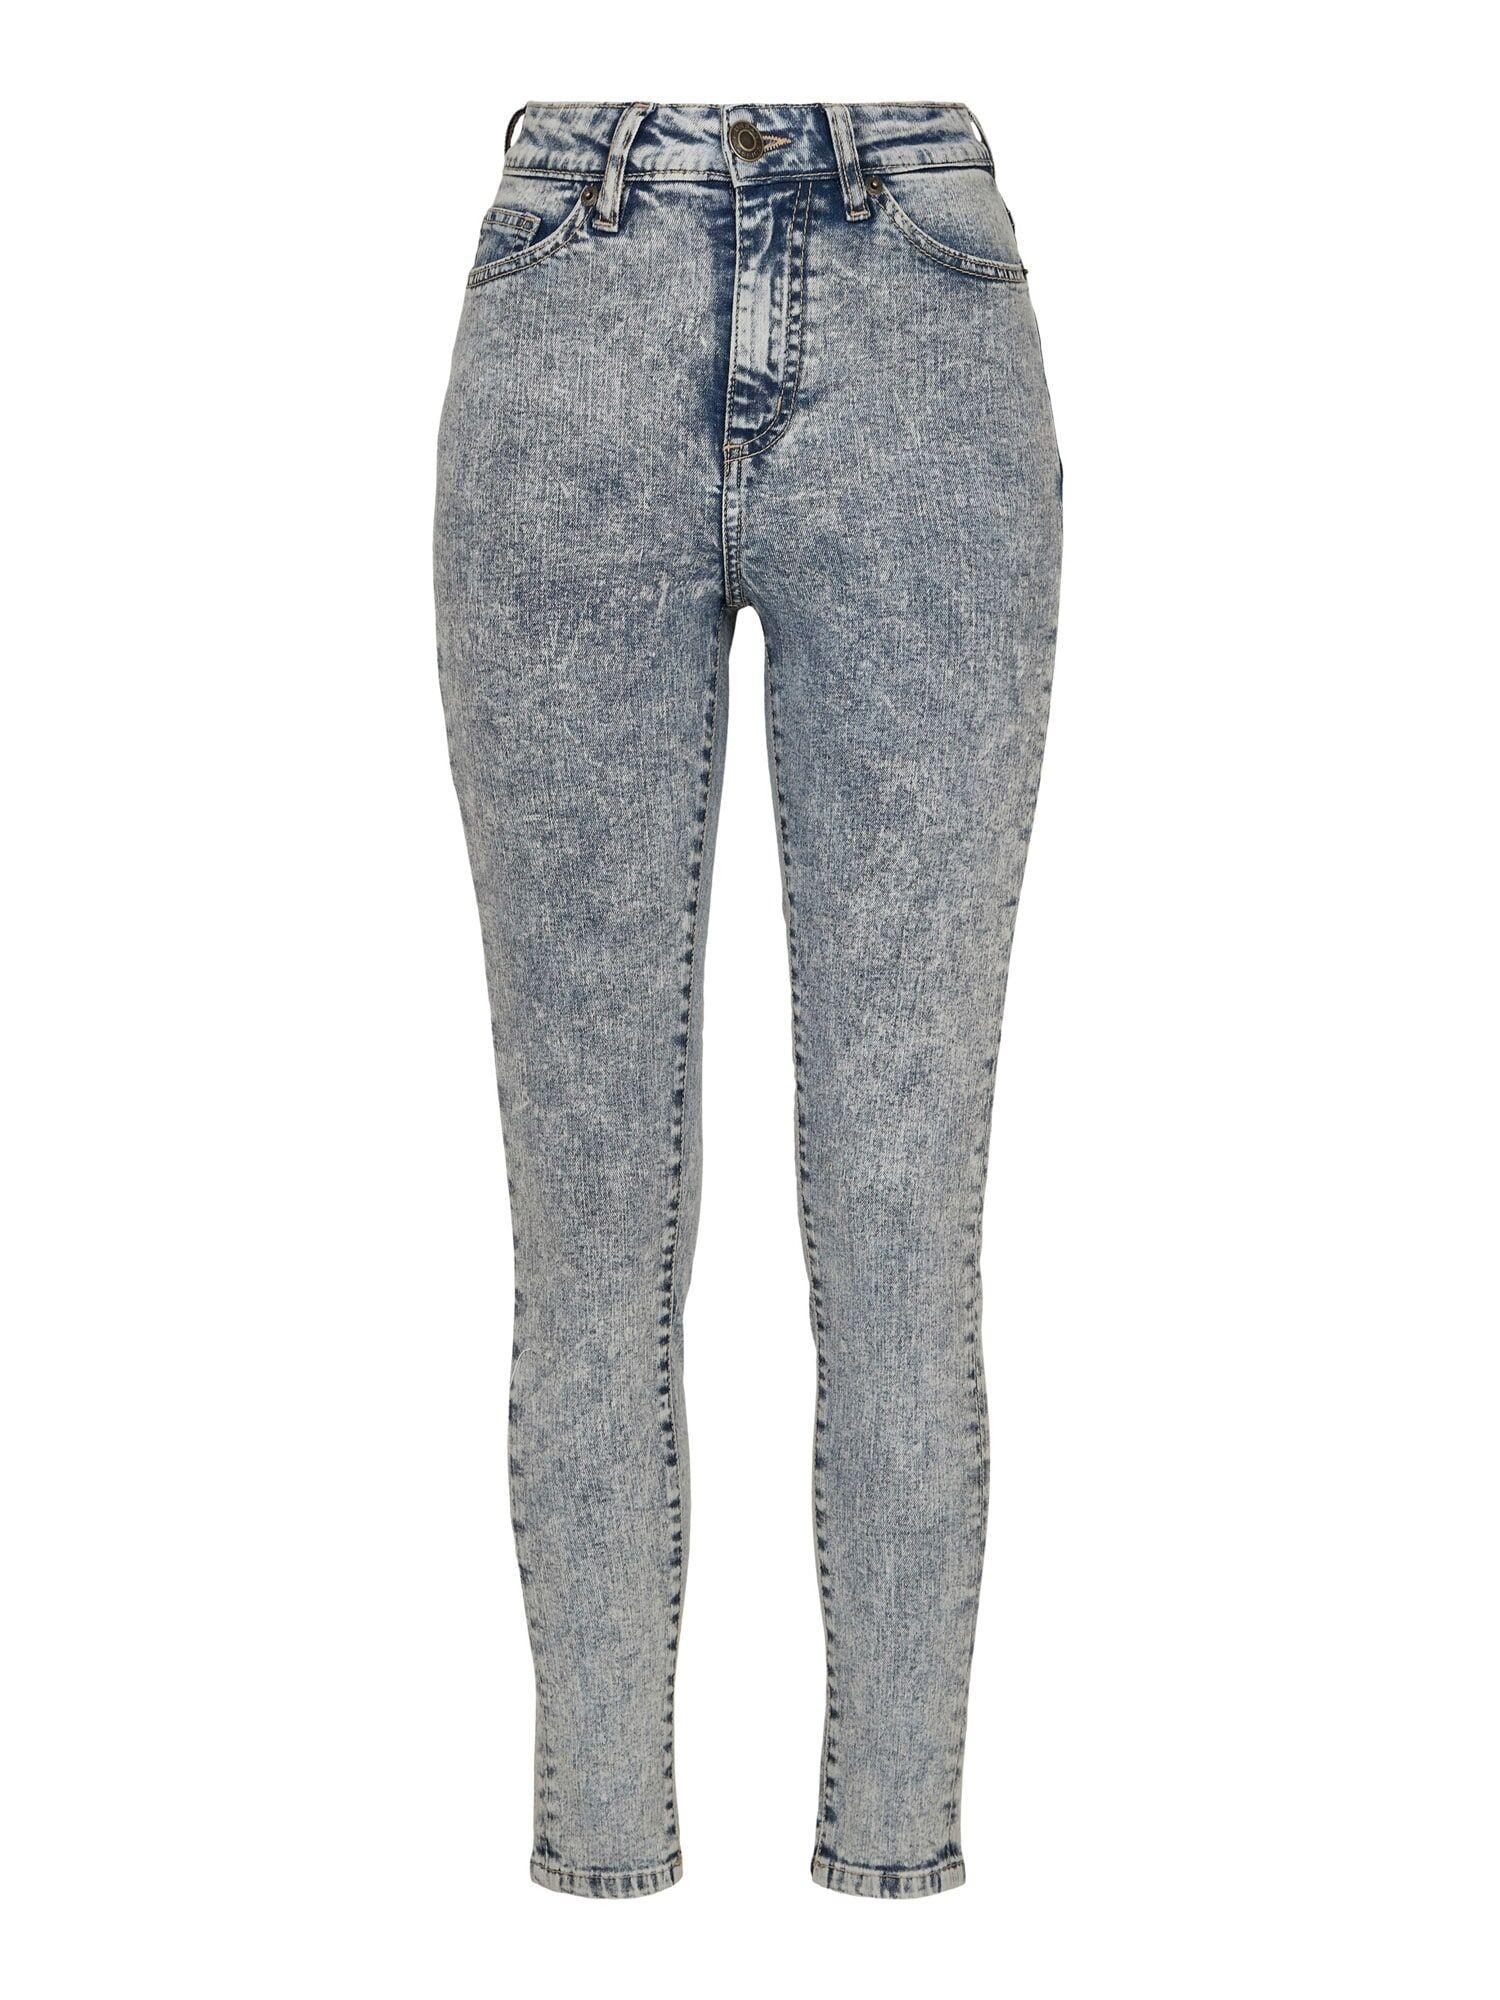 Urban Classics Jean  - Bleu - Taille: 29 - female